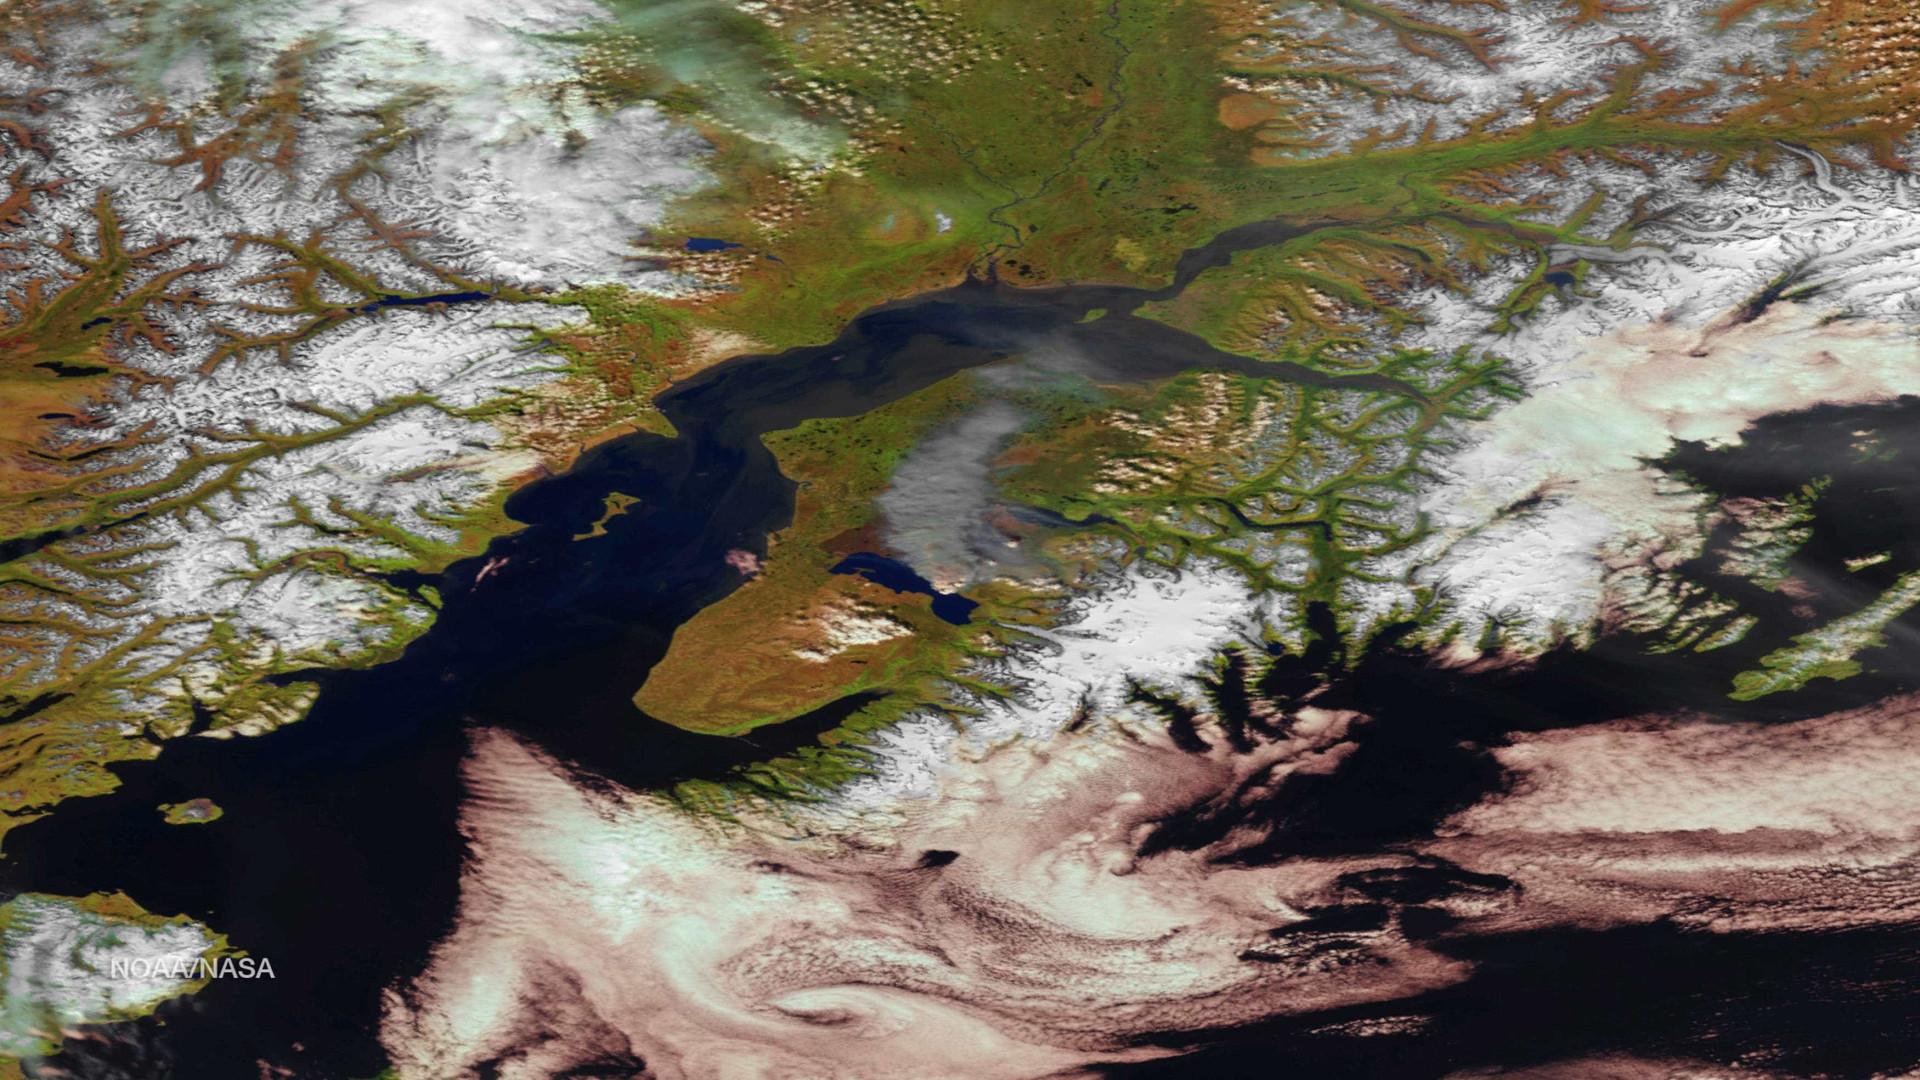 Terremoto de 8.2 atinge Alasca e gera alerta de tsunami